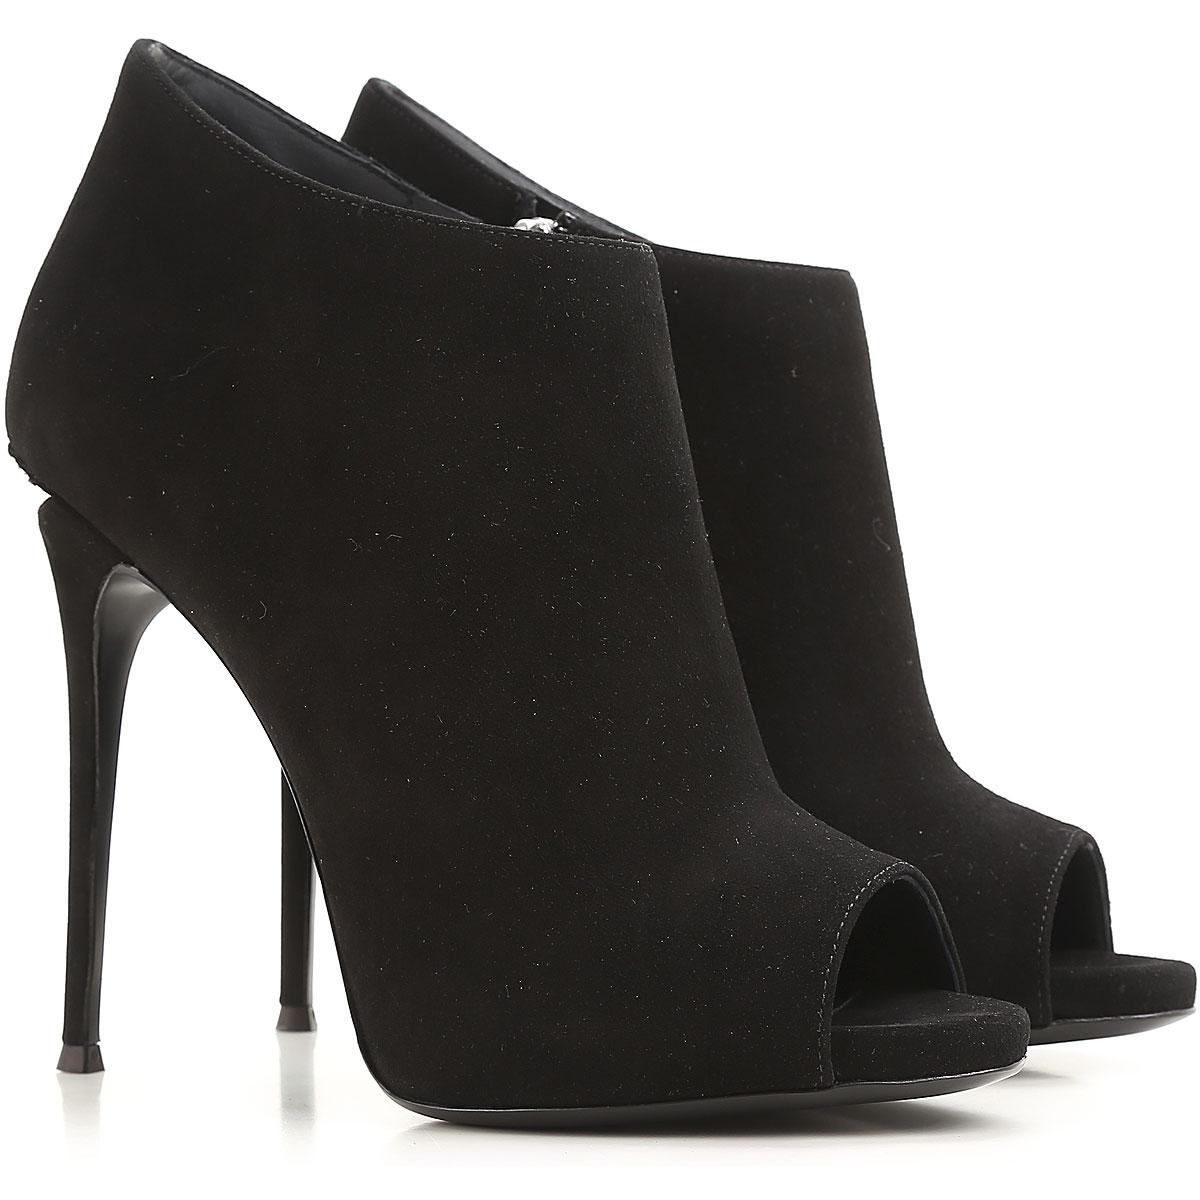 Image of Giuseppe Zanotti Design Peep Toe Open Shoes & Heels, Black, suede, 2017, 11 6 8 9